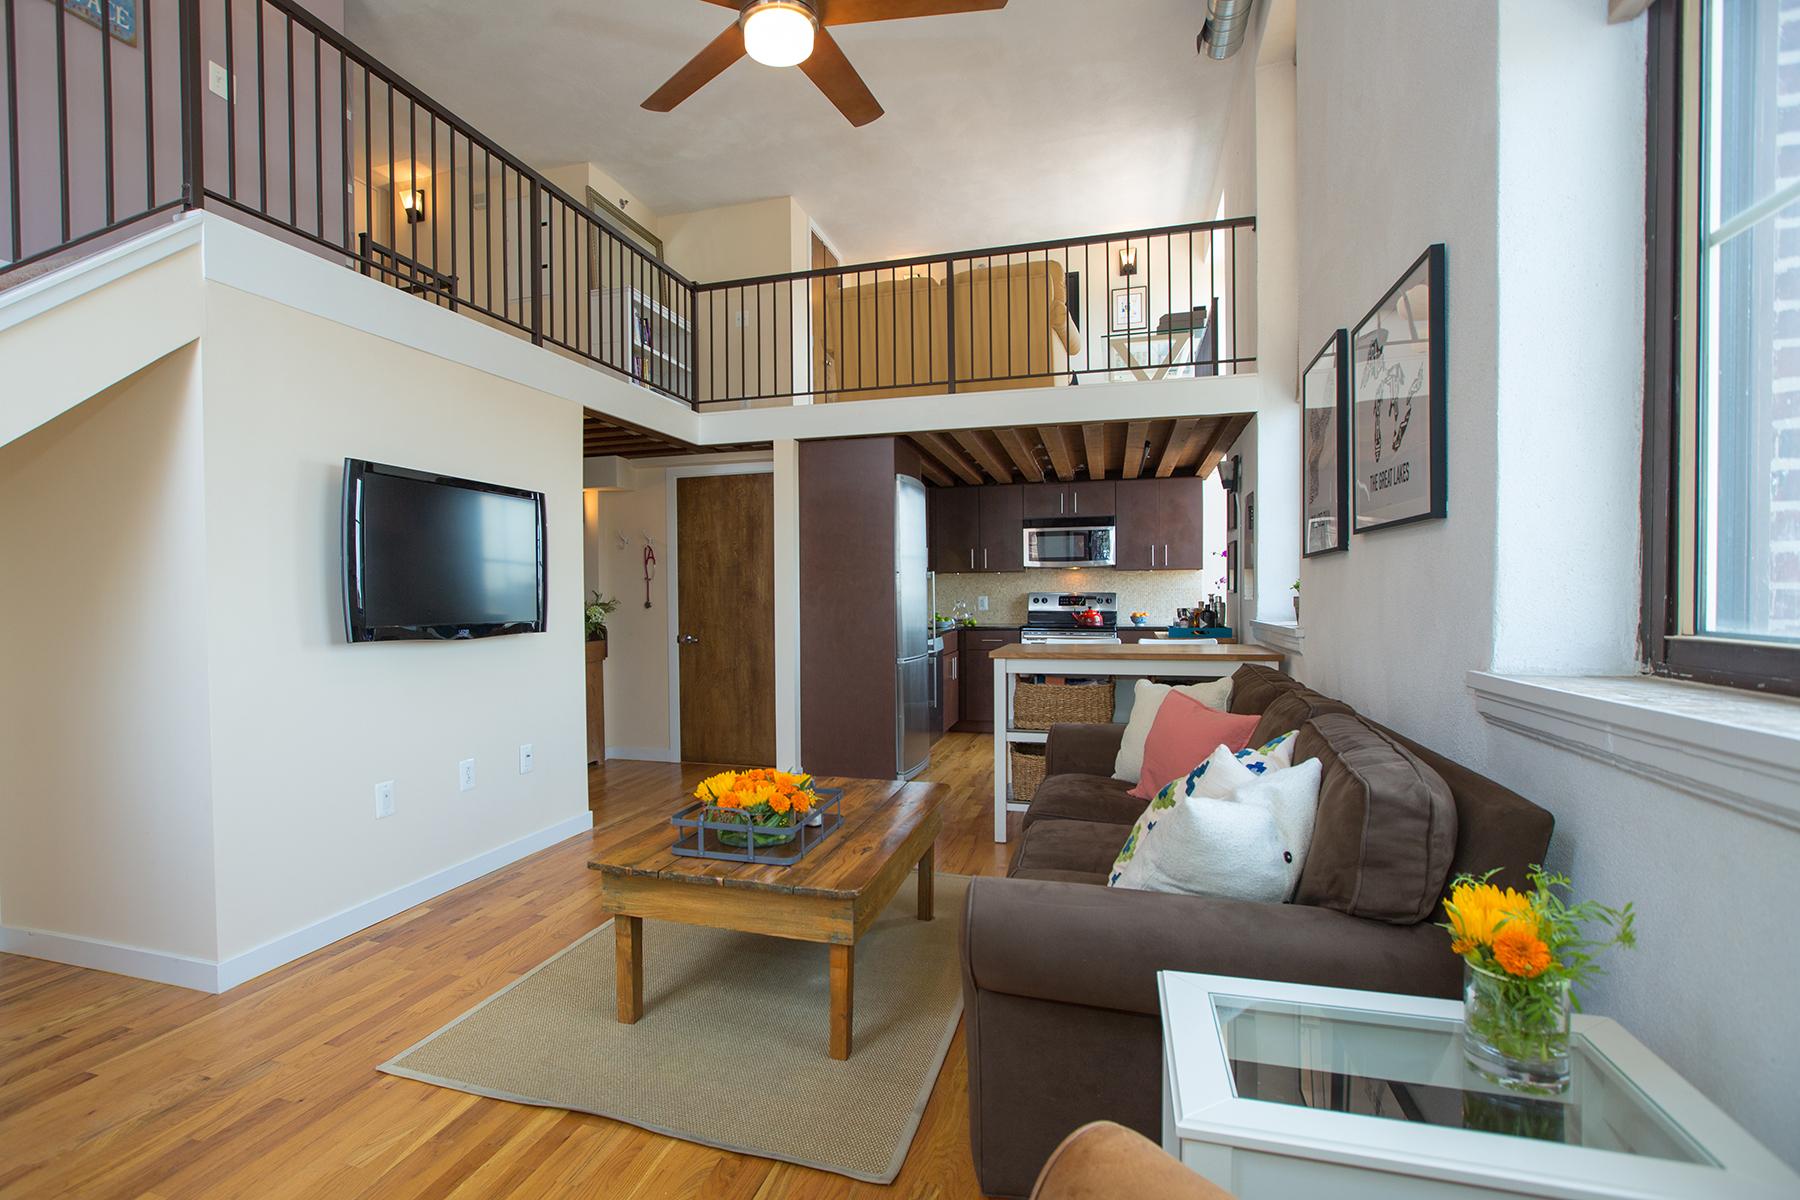 Condomínio para Venda às Hawthorne Loft Condominiums 1201-15 Fitzwater Street Unit 403 Philadelphia, Pensilvânia 19147 Estados Unidos